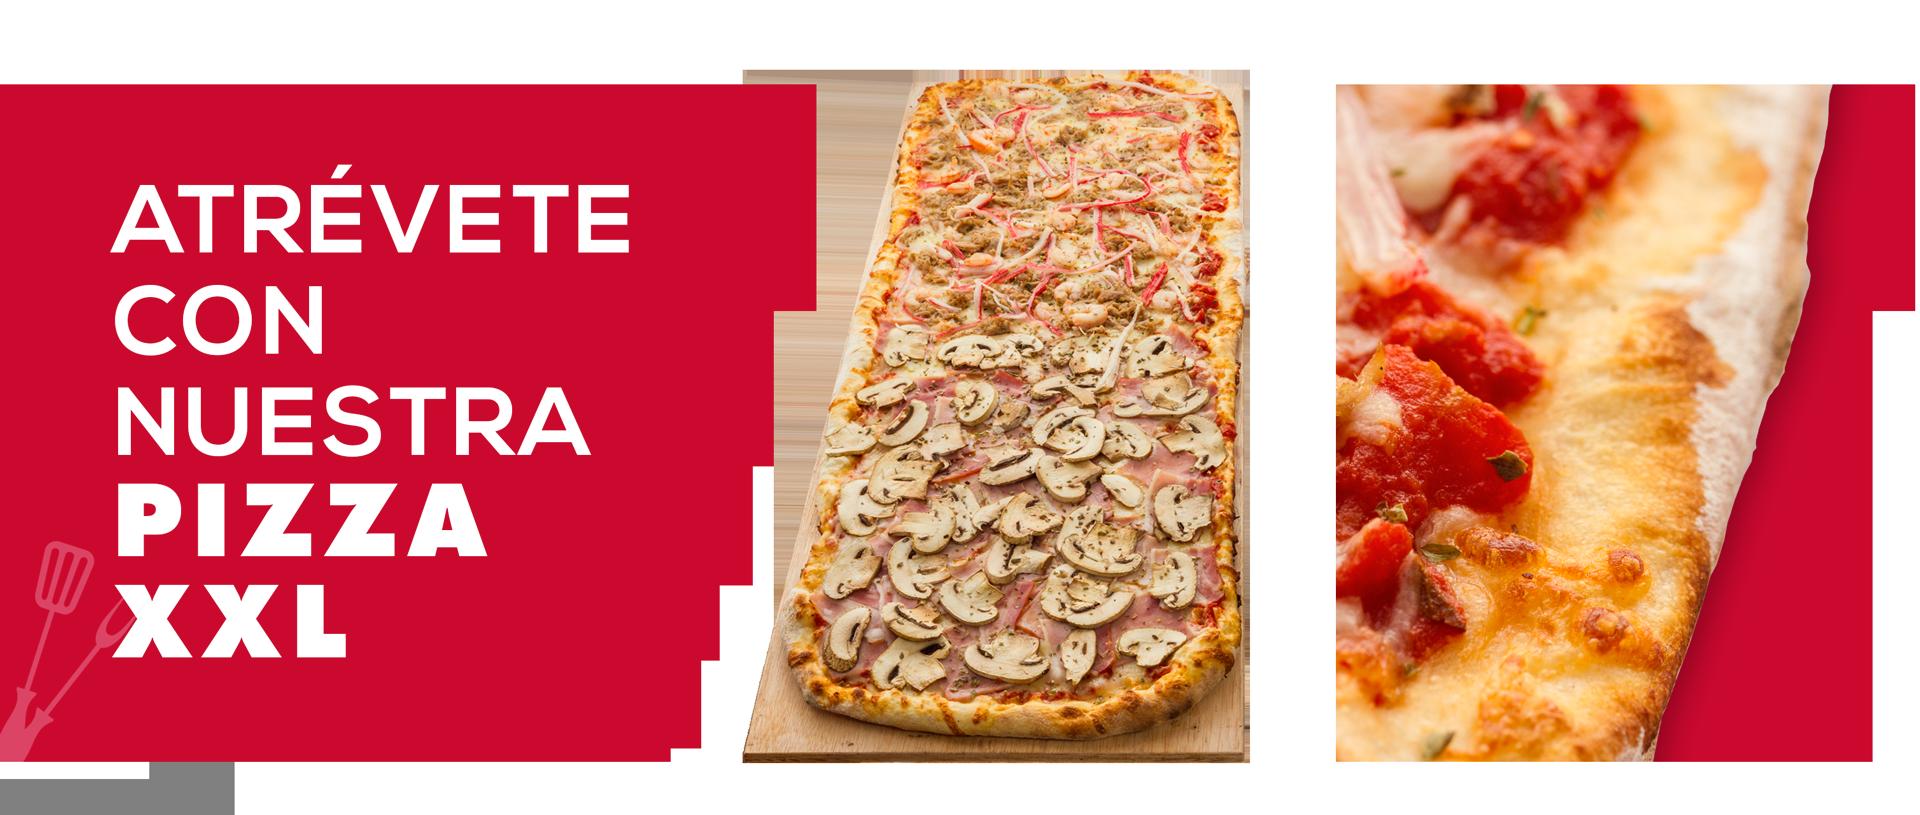 atrevete-pizza-XXL